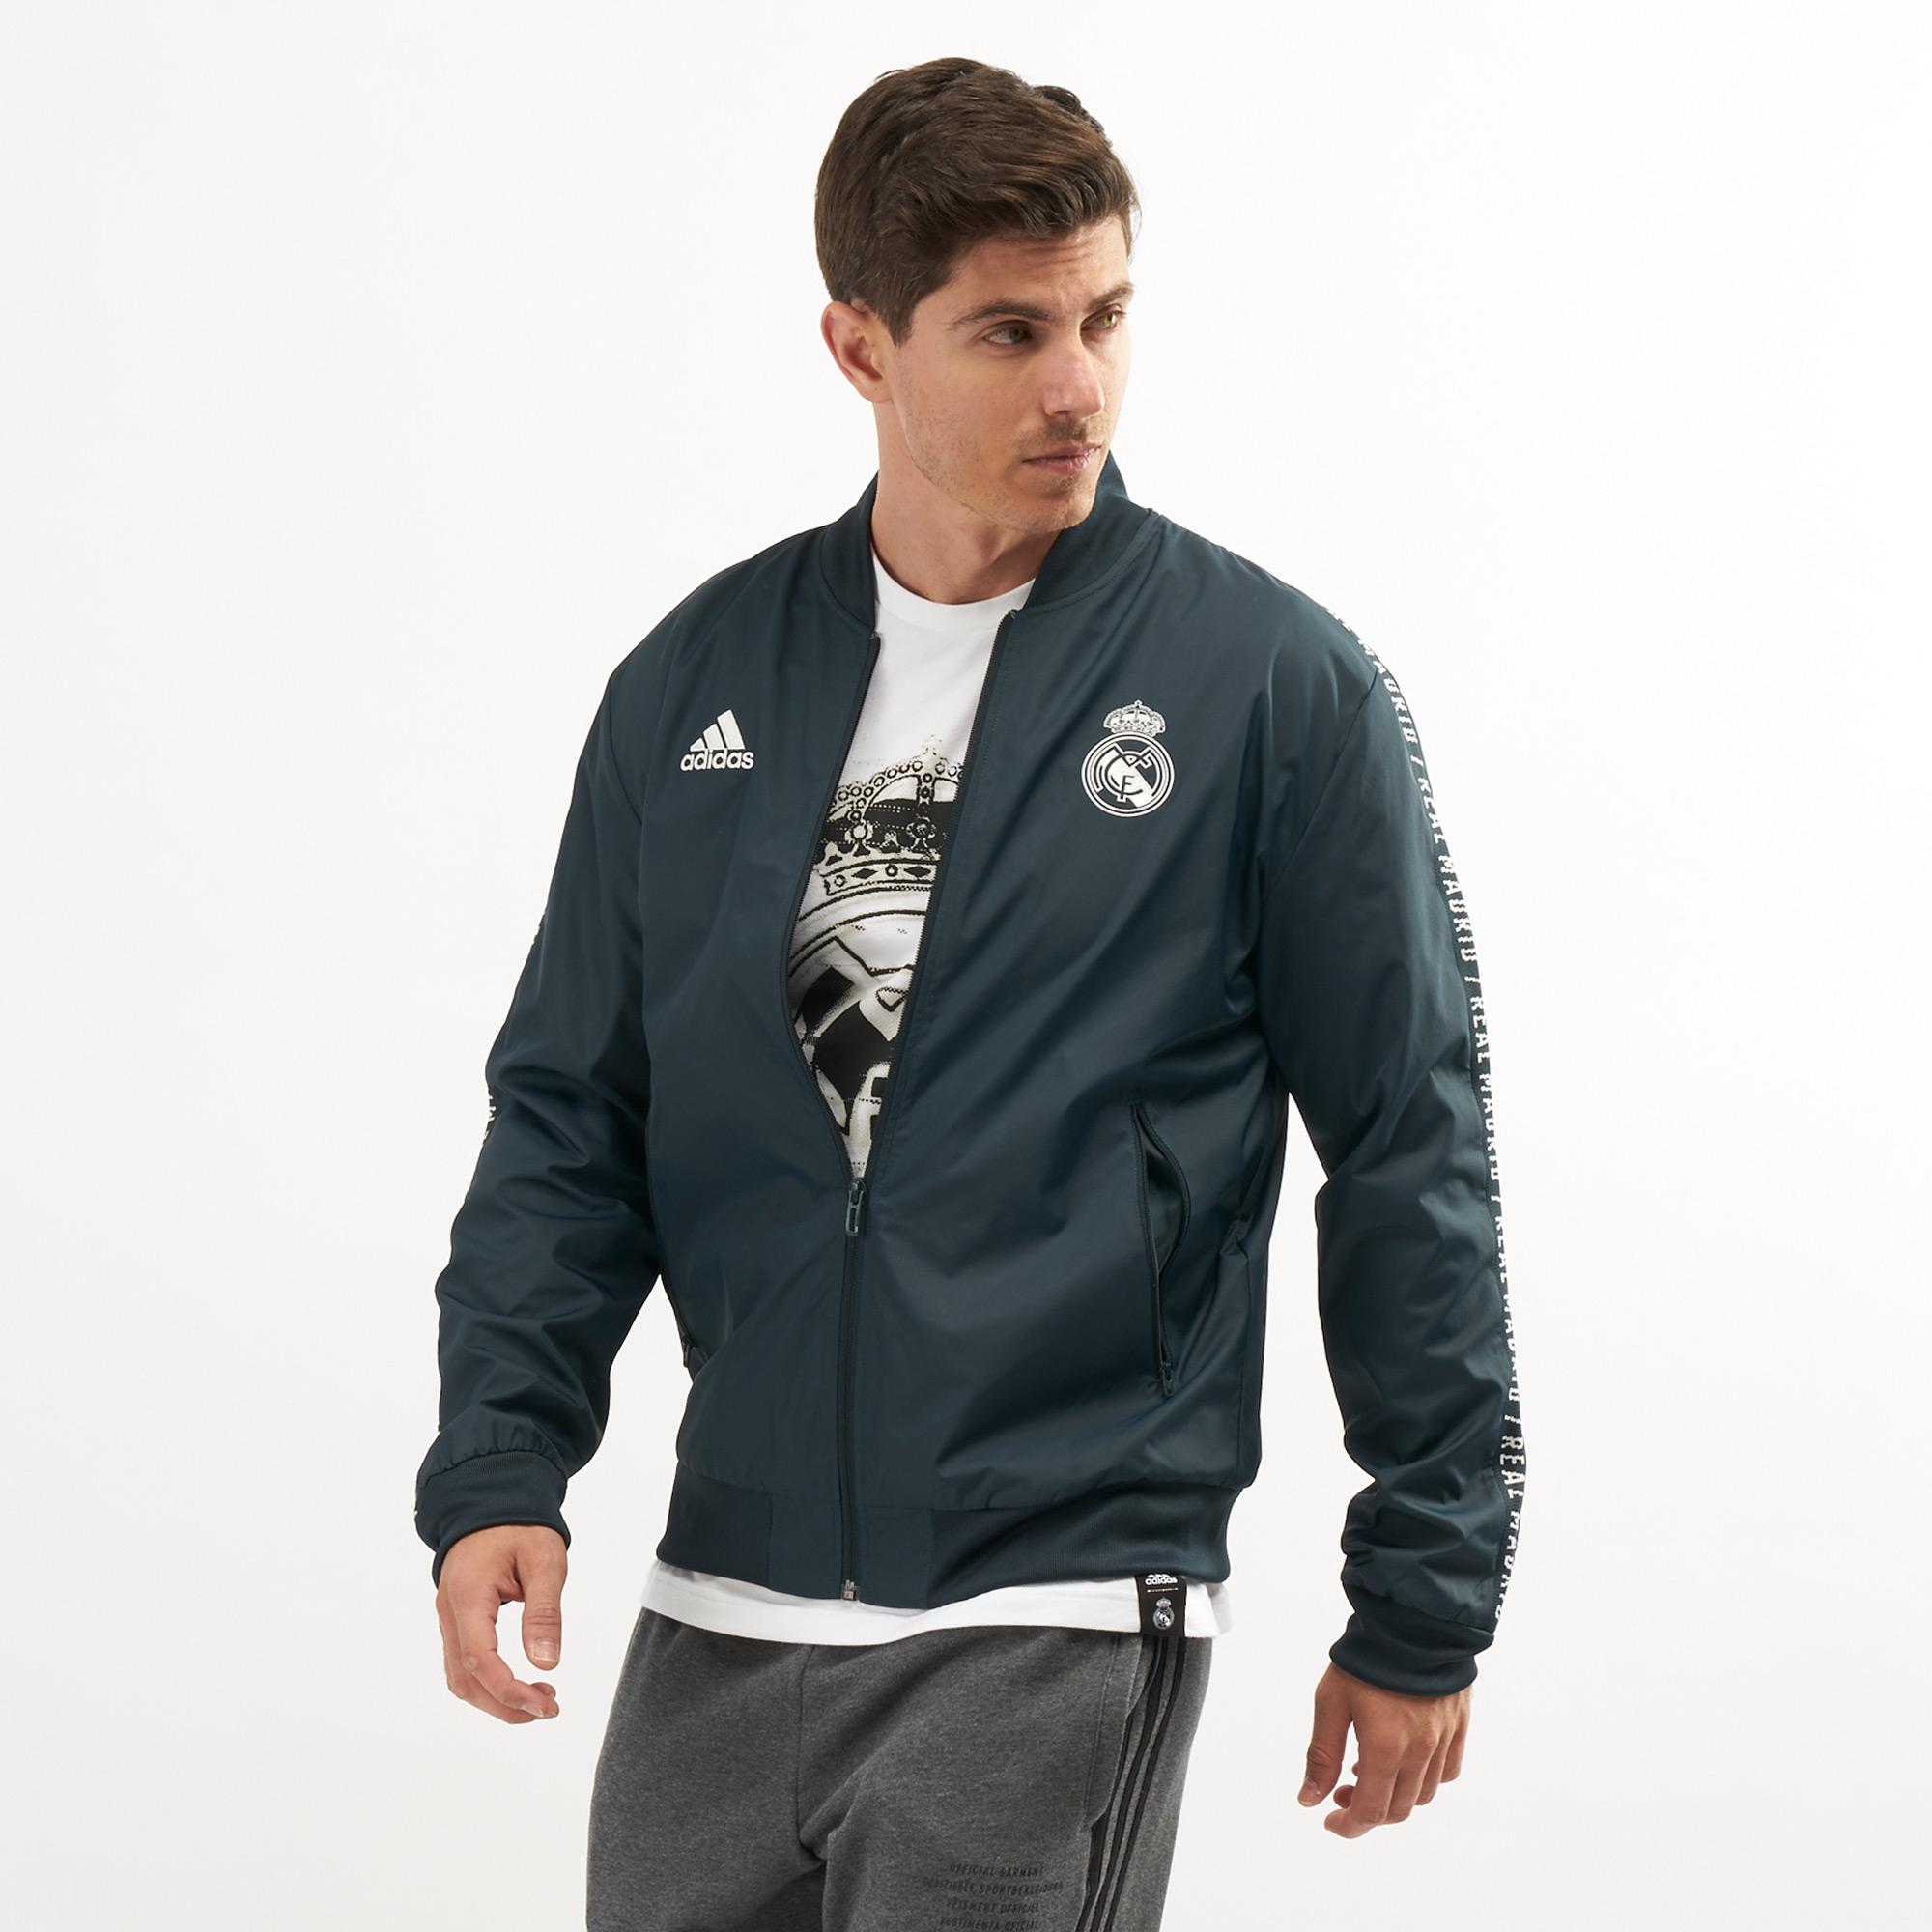 fb6a2a2947 adidas Men's Real Madrid Anthem Jacket